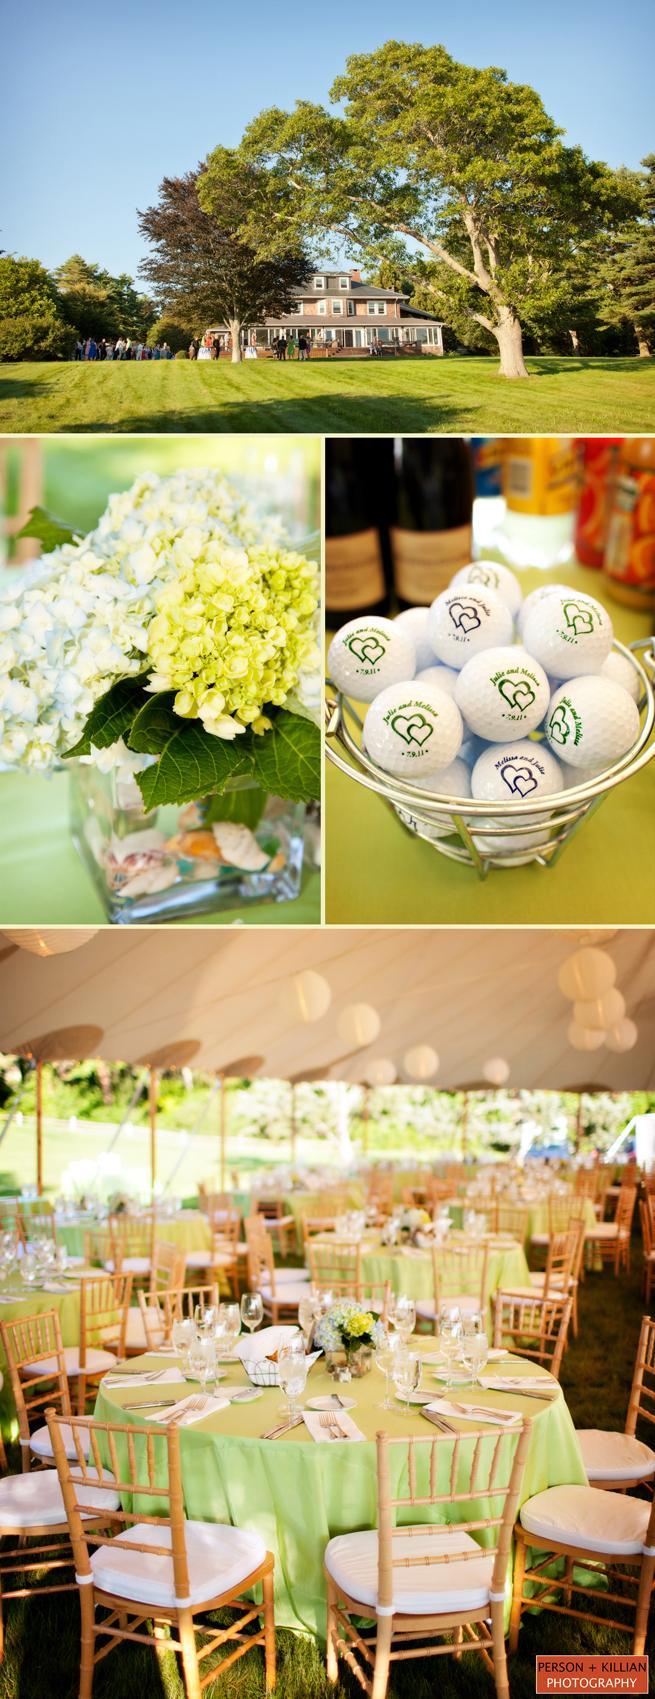 Tented Wedding Decor Rentals